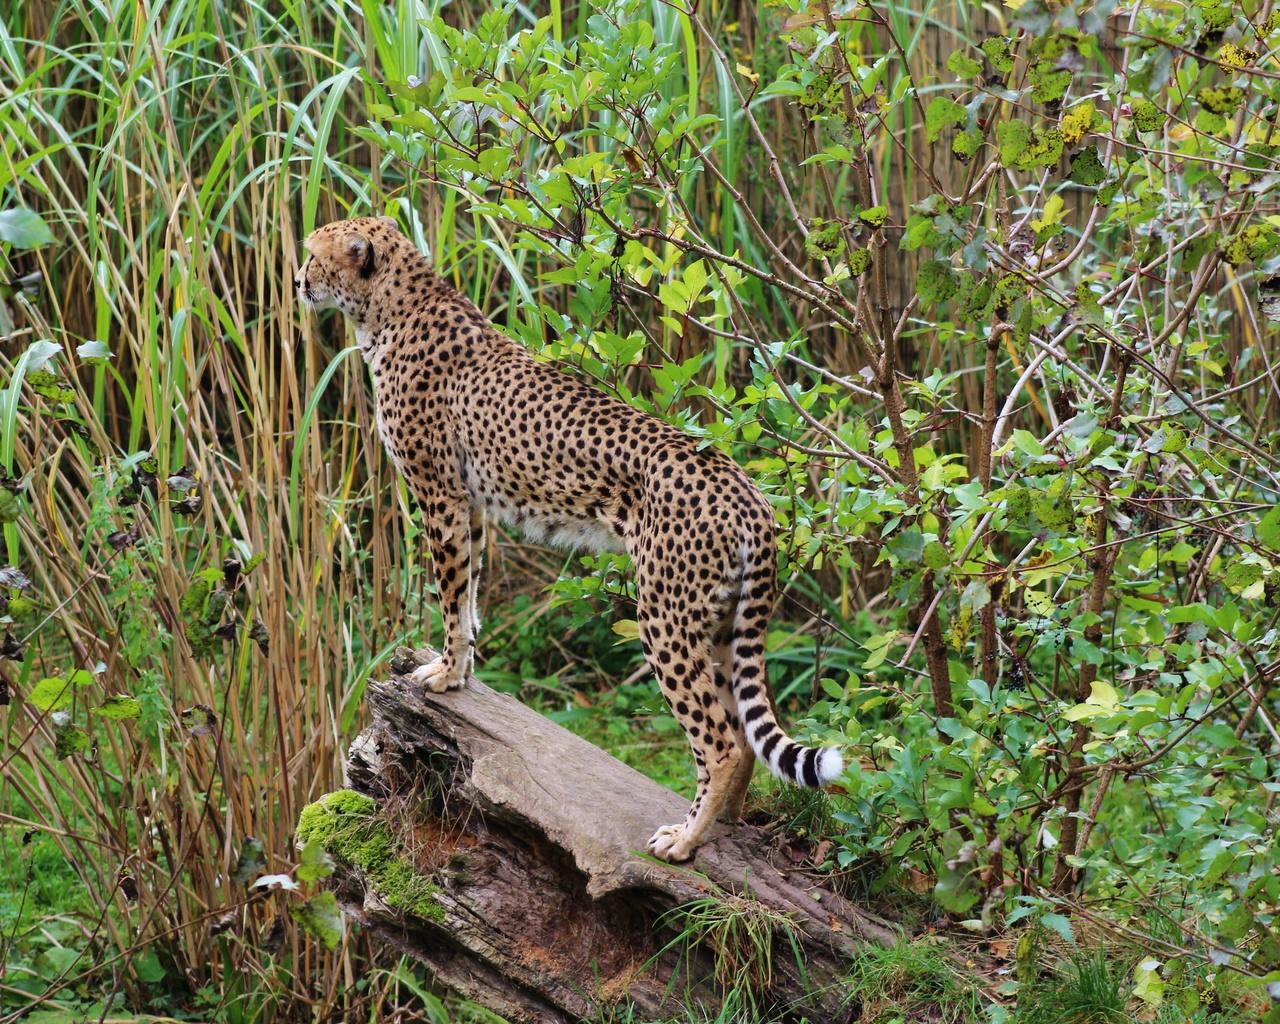 леопард, большая кошка, пятна, хищник